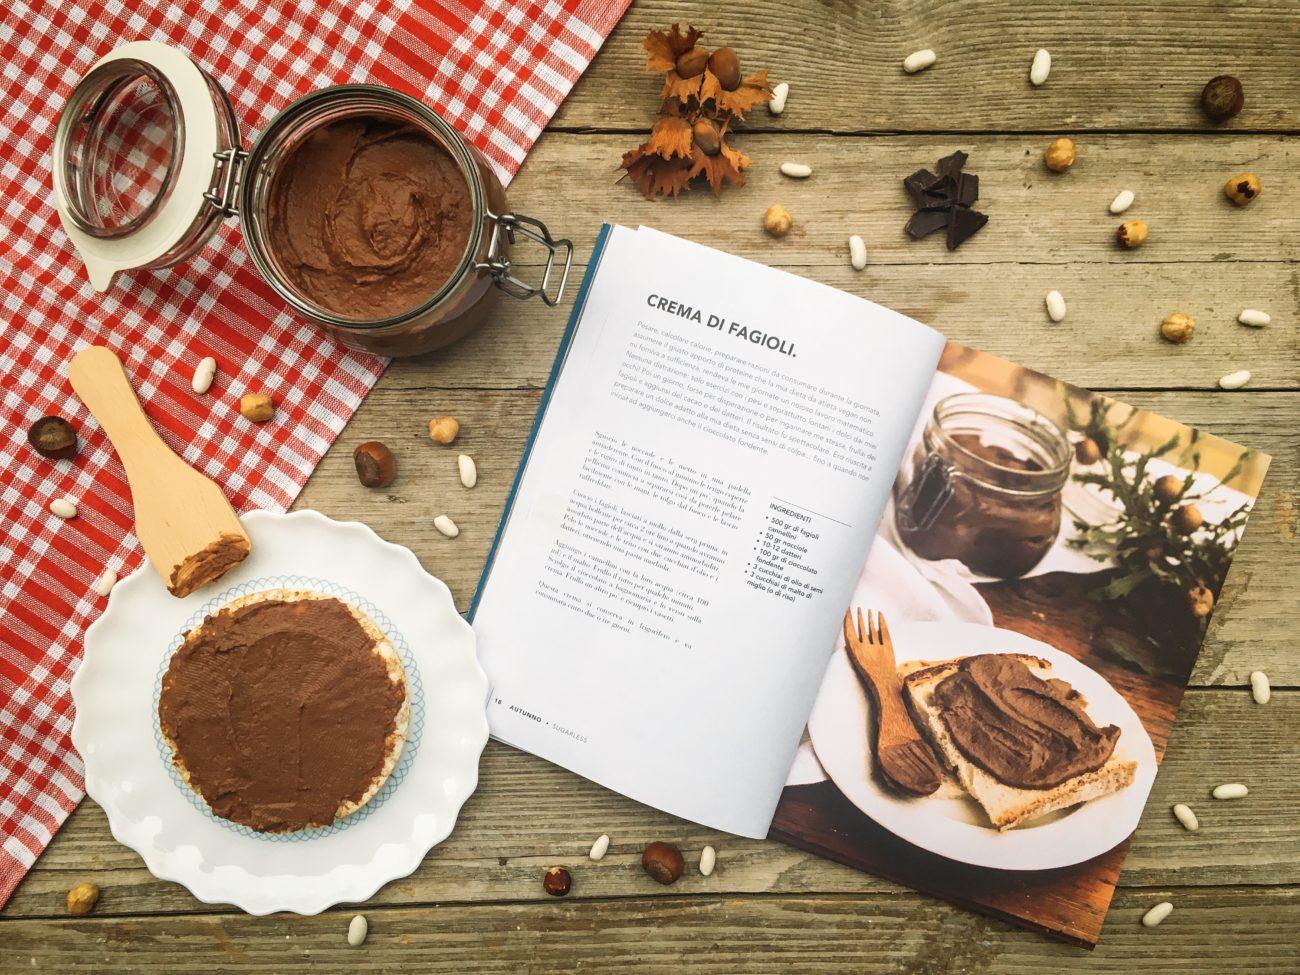 crema cioccolatina sugarless - cucinare secondo natura